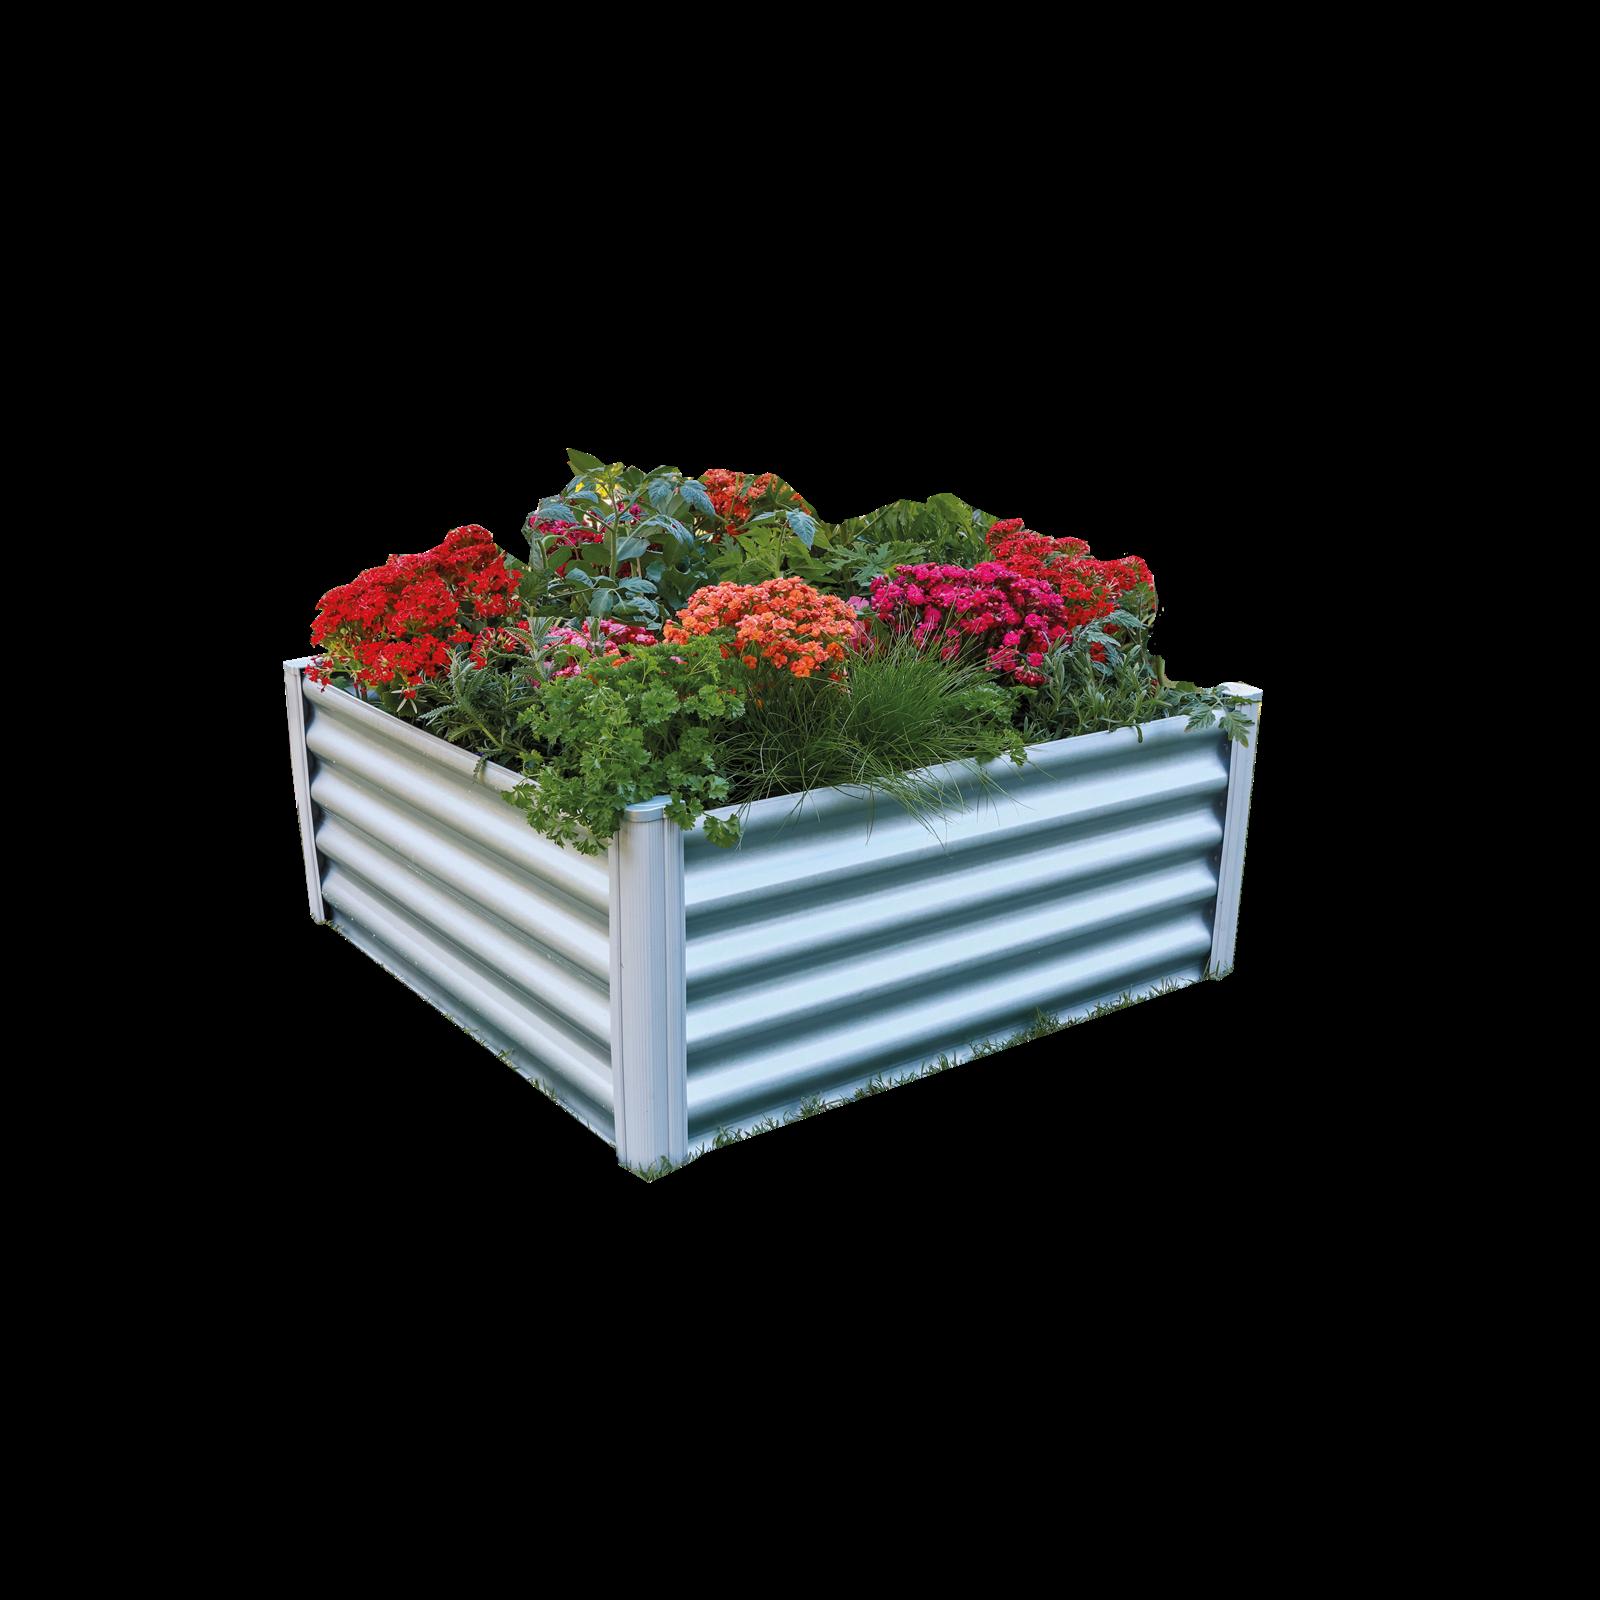 The Organic Garden Co 100 x 100 x 30cm Zincalume Square Raised Garden Bed